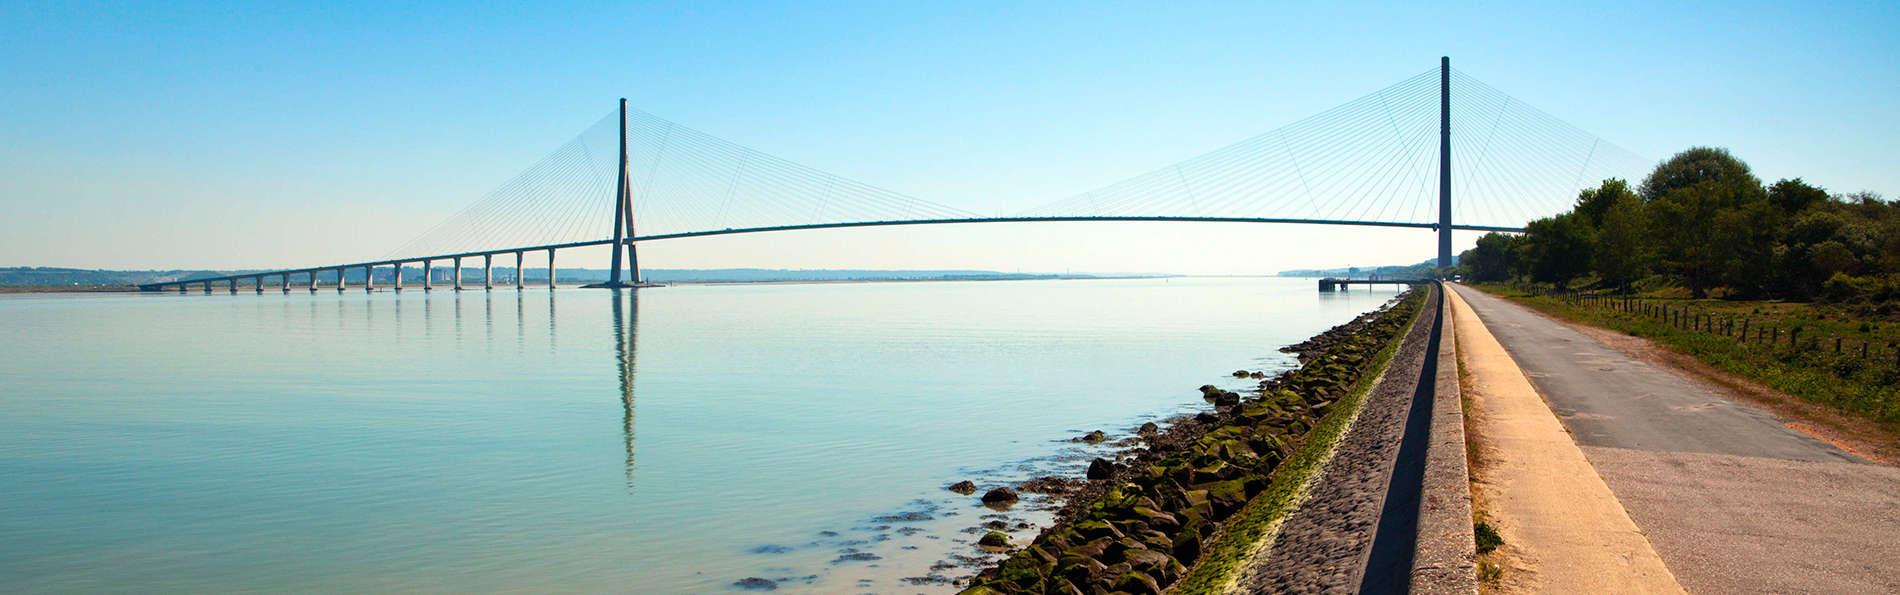 Best Western ARThotel - EDIT_Pont_du_Normandie__Le_Havre__France_-_iStockphoto_-_Thinkstock.jpg